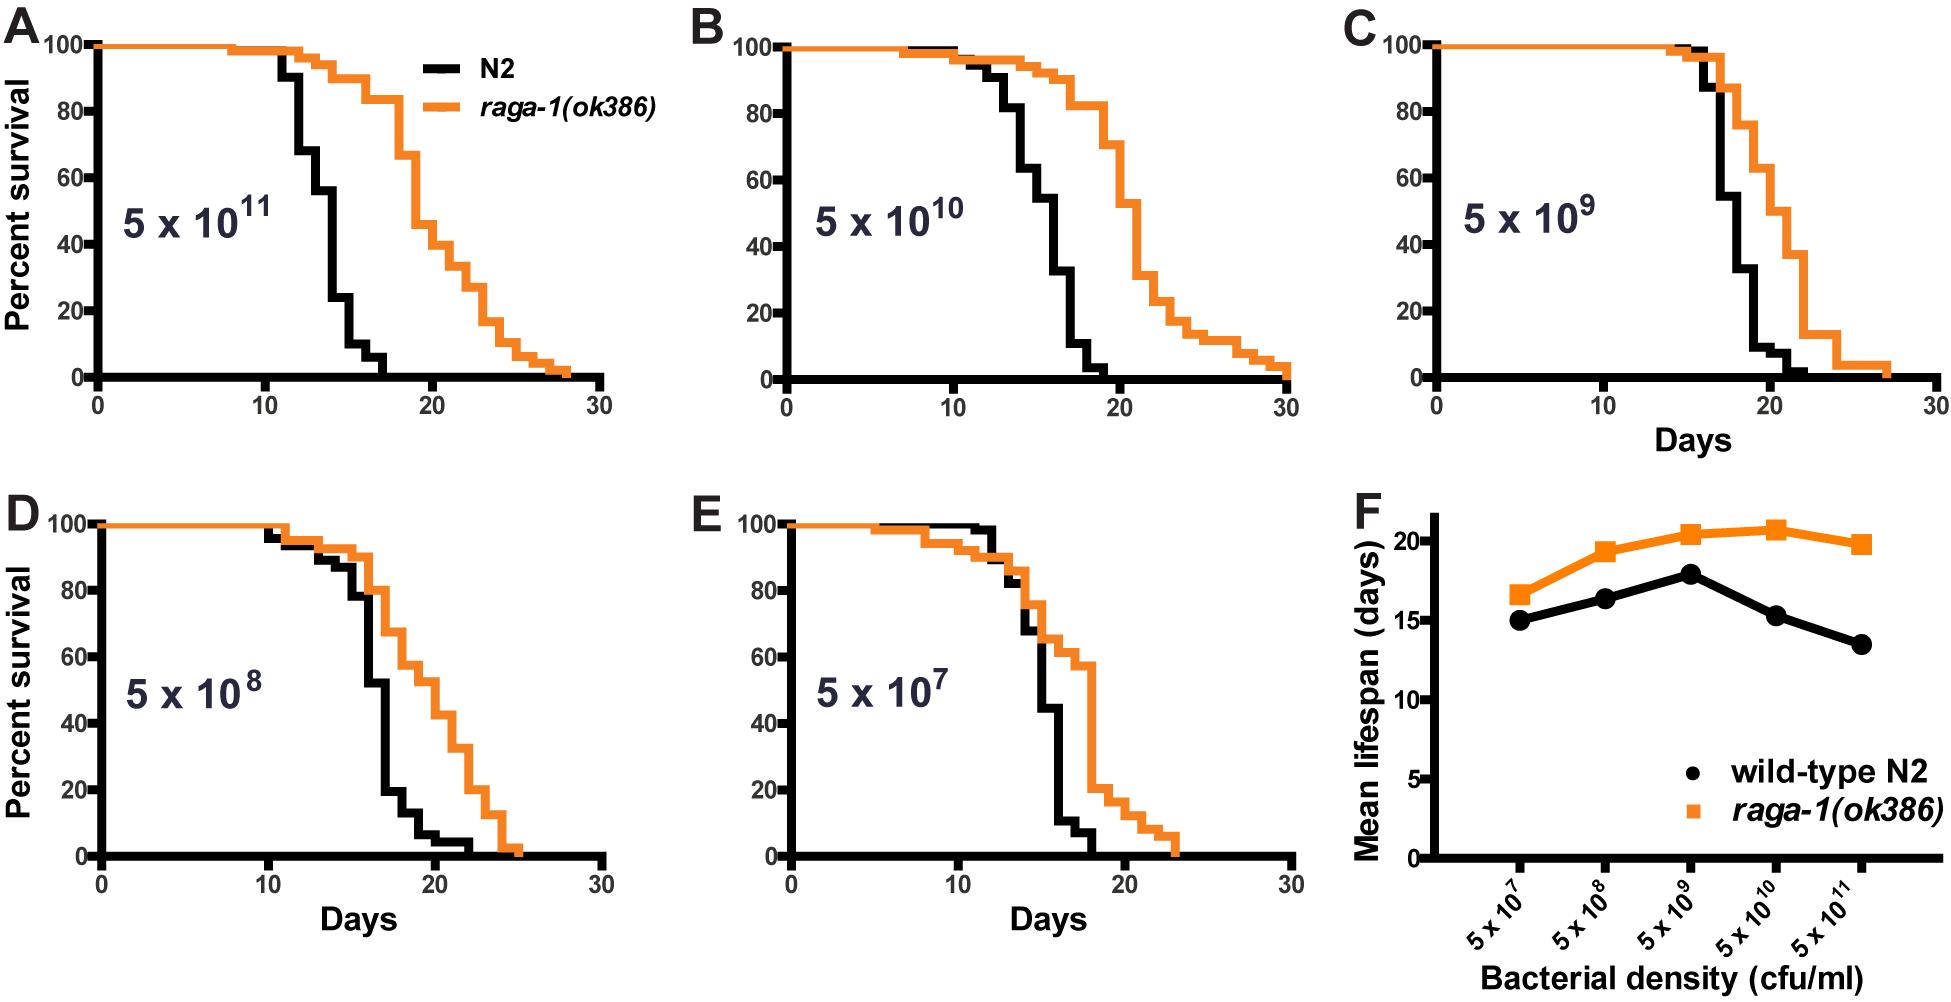 Effect of dietary restriction on <i>raga-1(ok386)</i> lifespan.